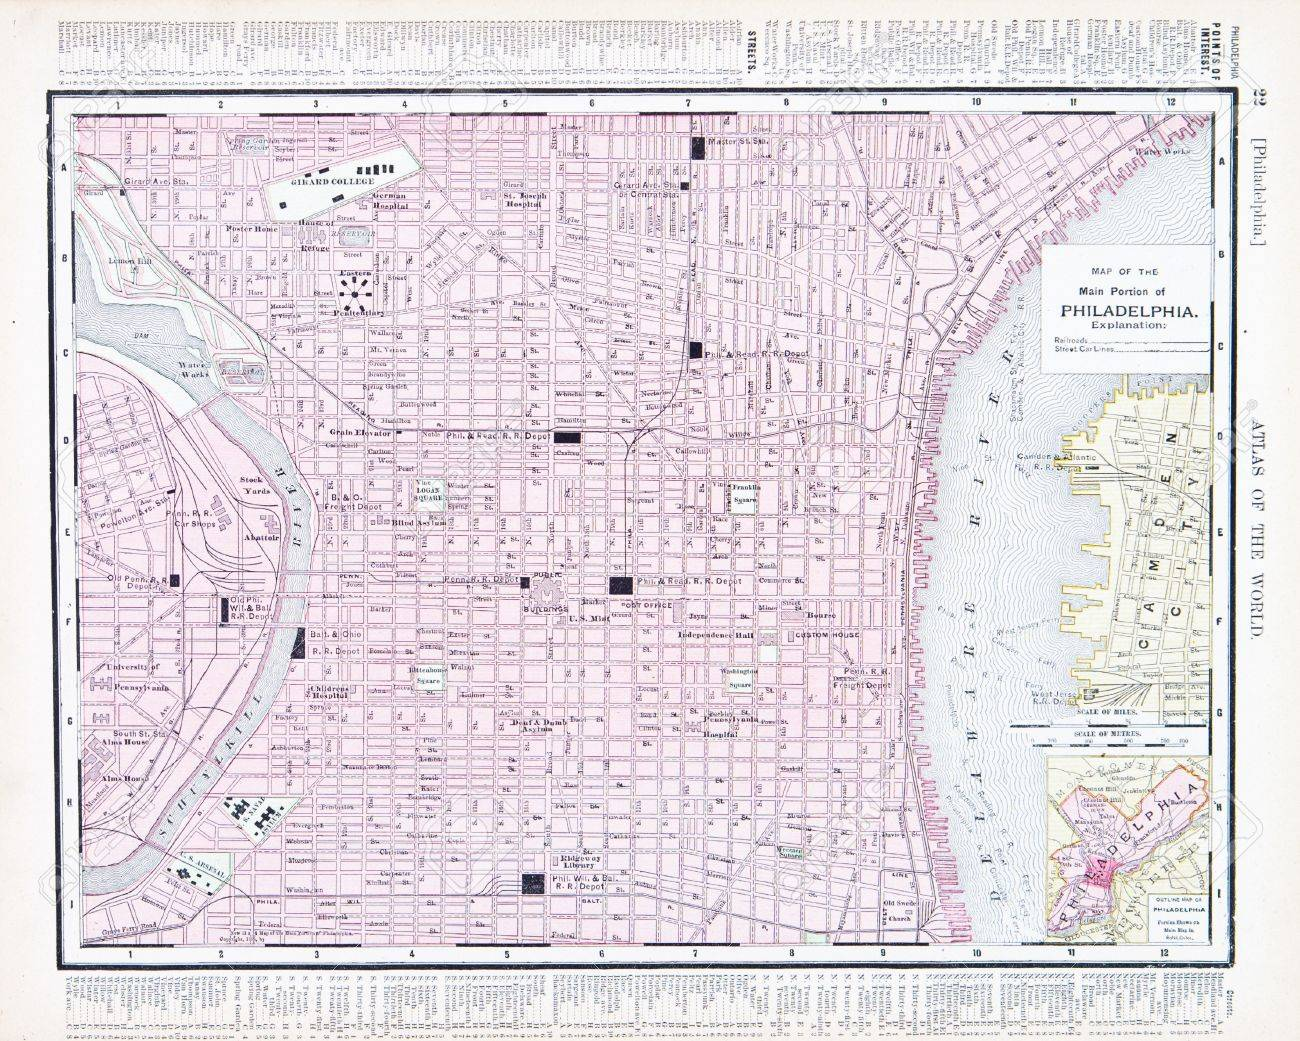 Vintage Map Of Philadelphia PA United States Stock Photo - Philadelphia capital of us origanal map